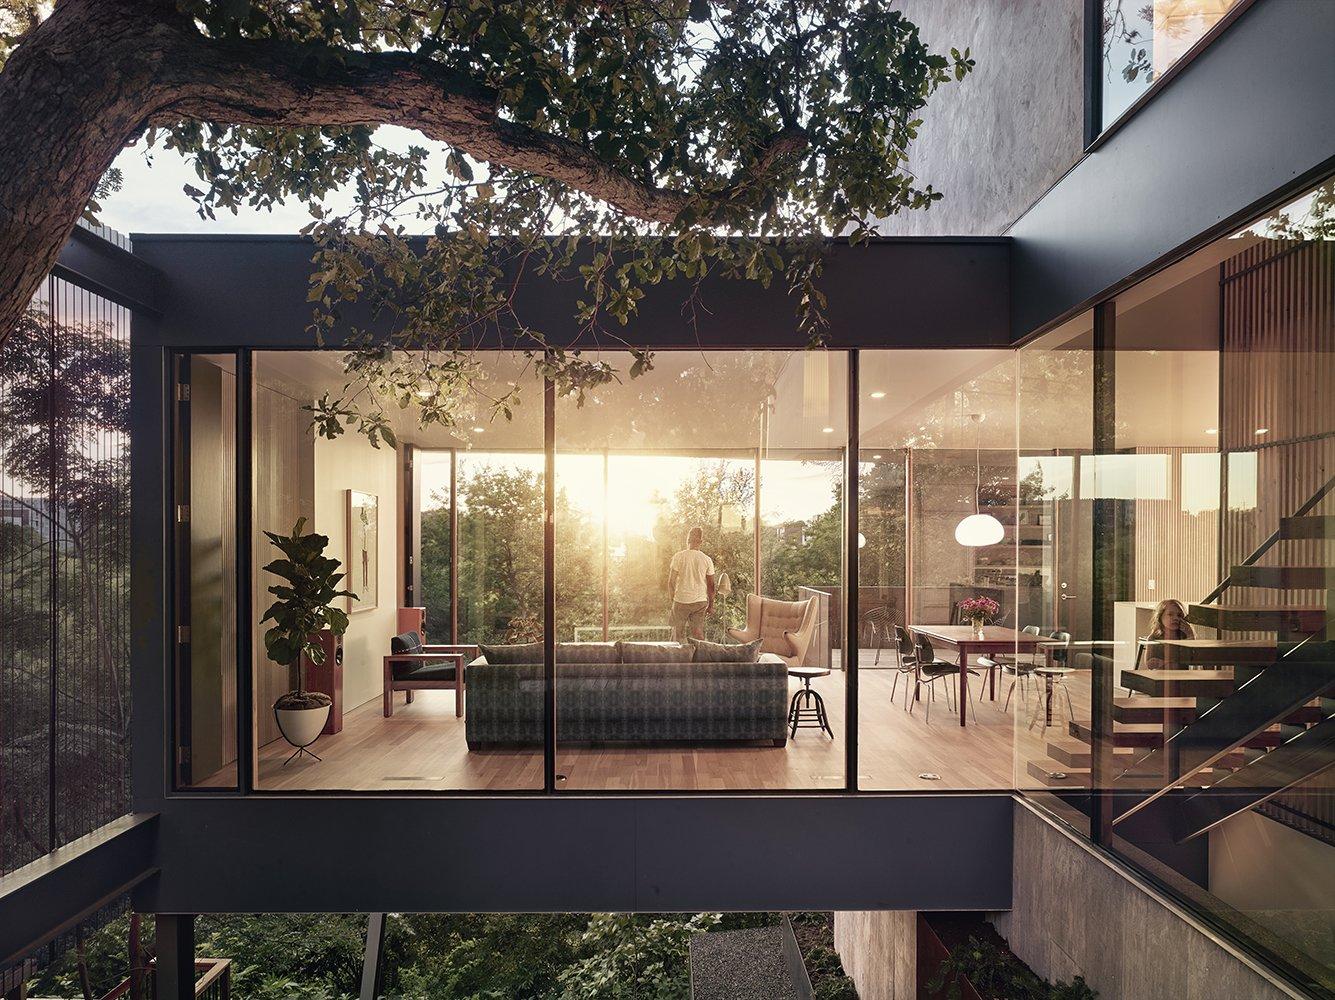 An Award-Winning Austin Home Hits the Market at $1.9M